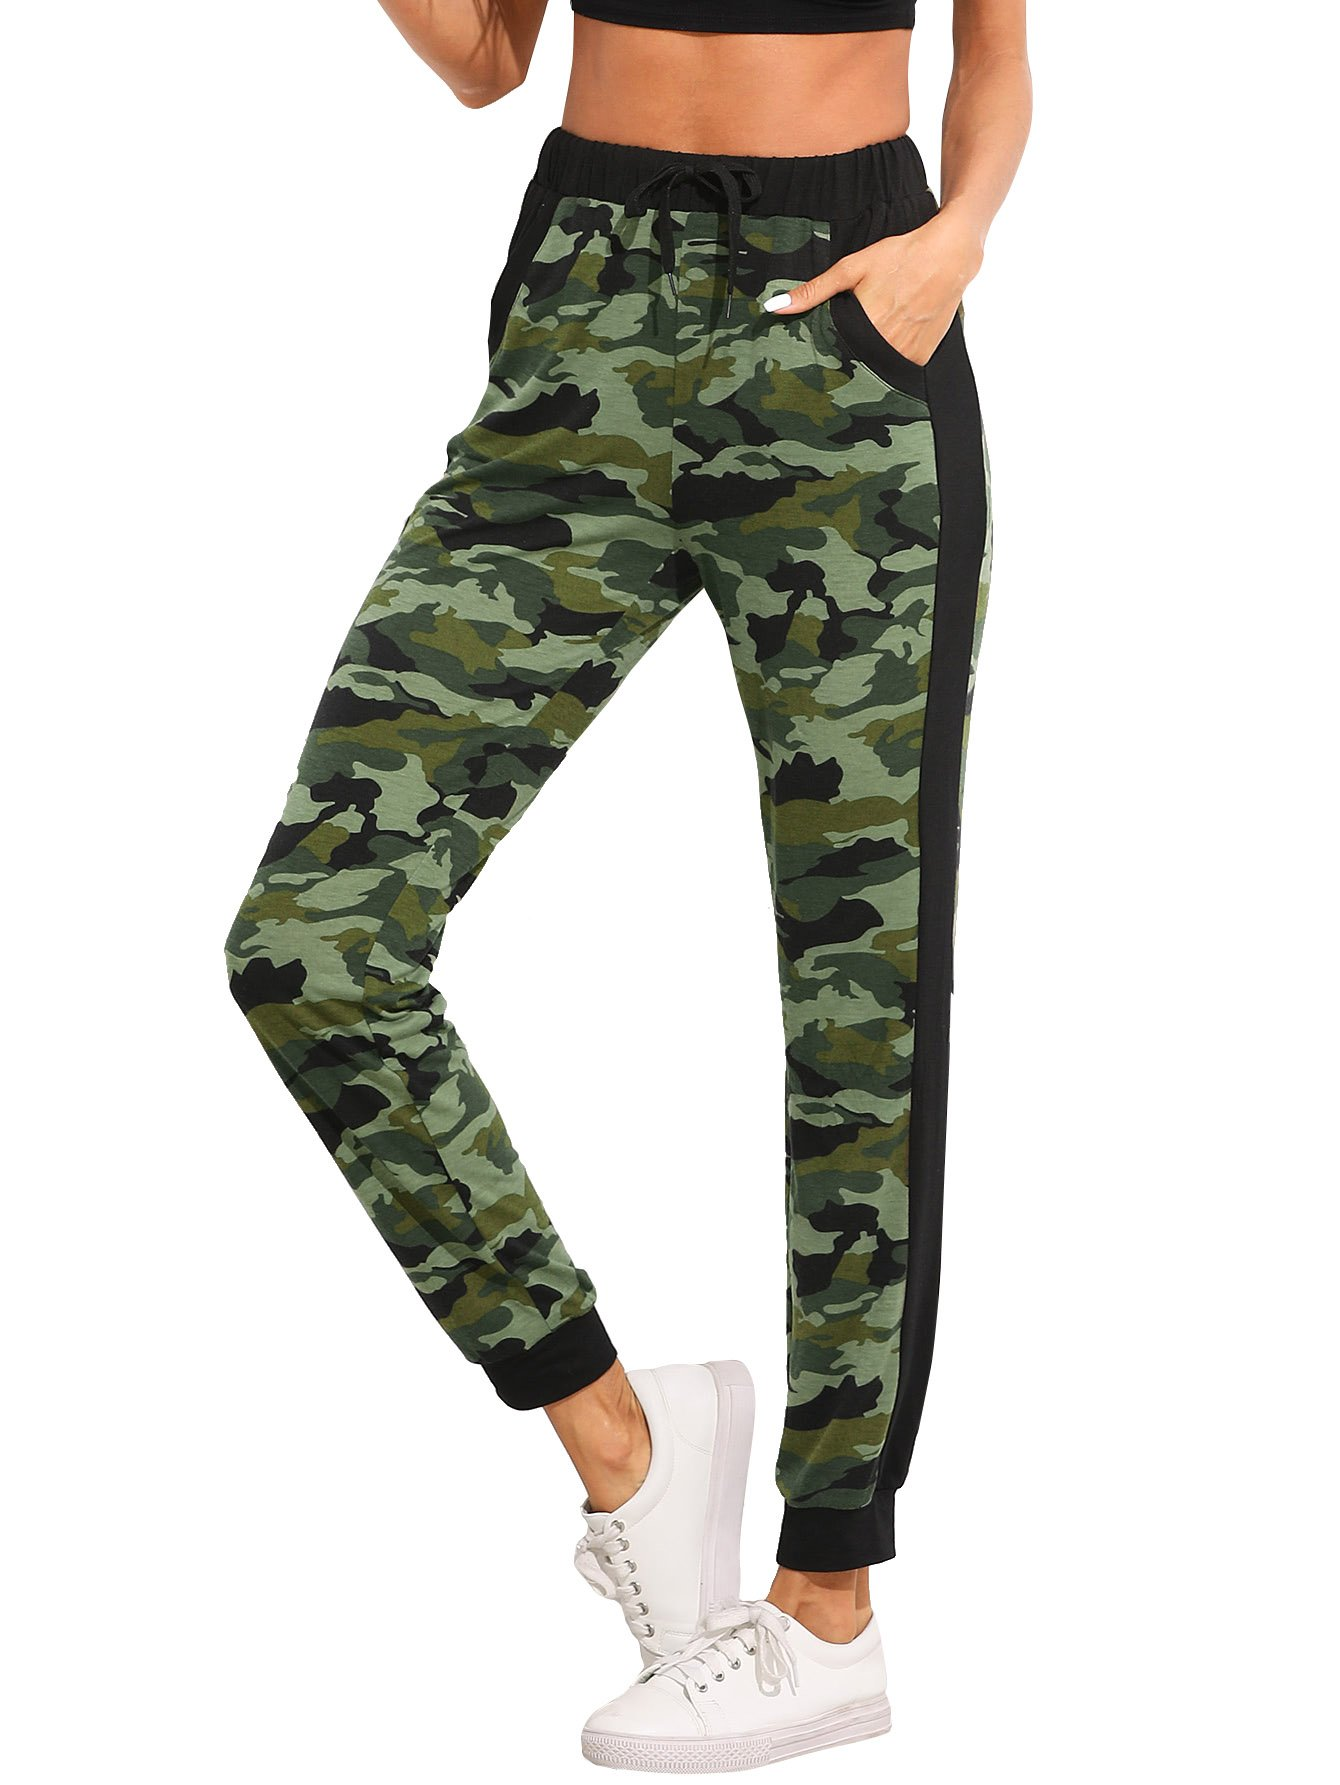 SweatyRocks Women's Drawstring Casual Joggers Pants with Pockets Camo XXL